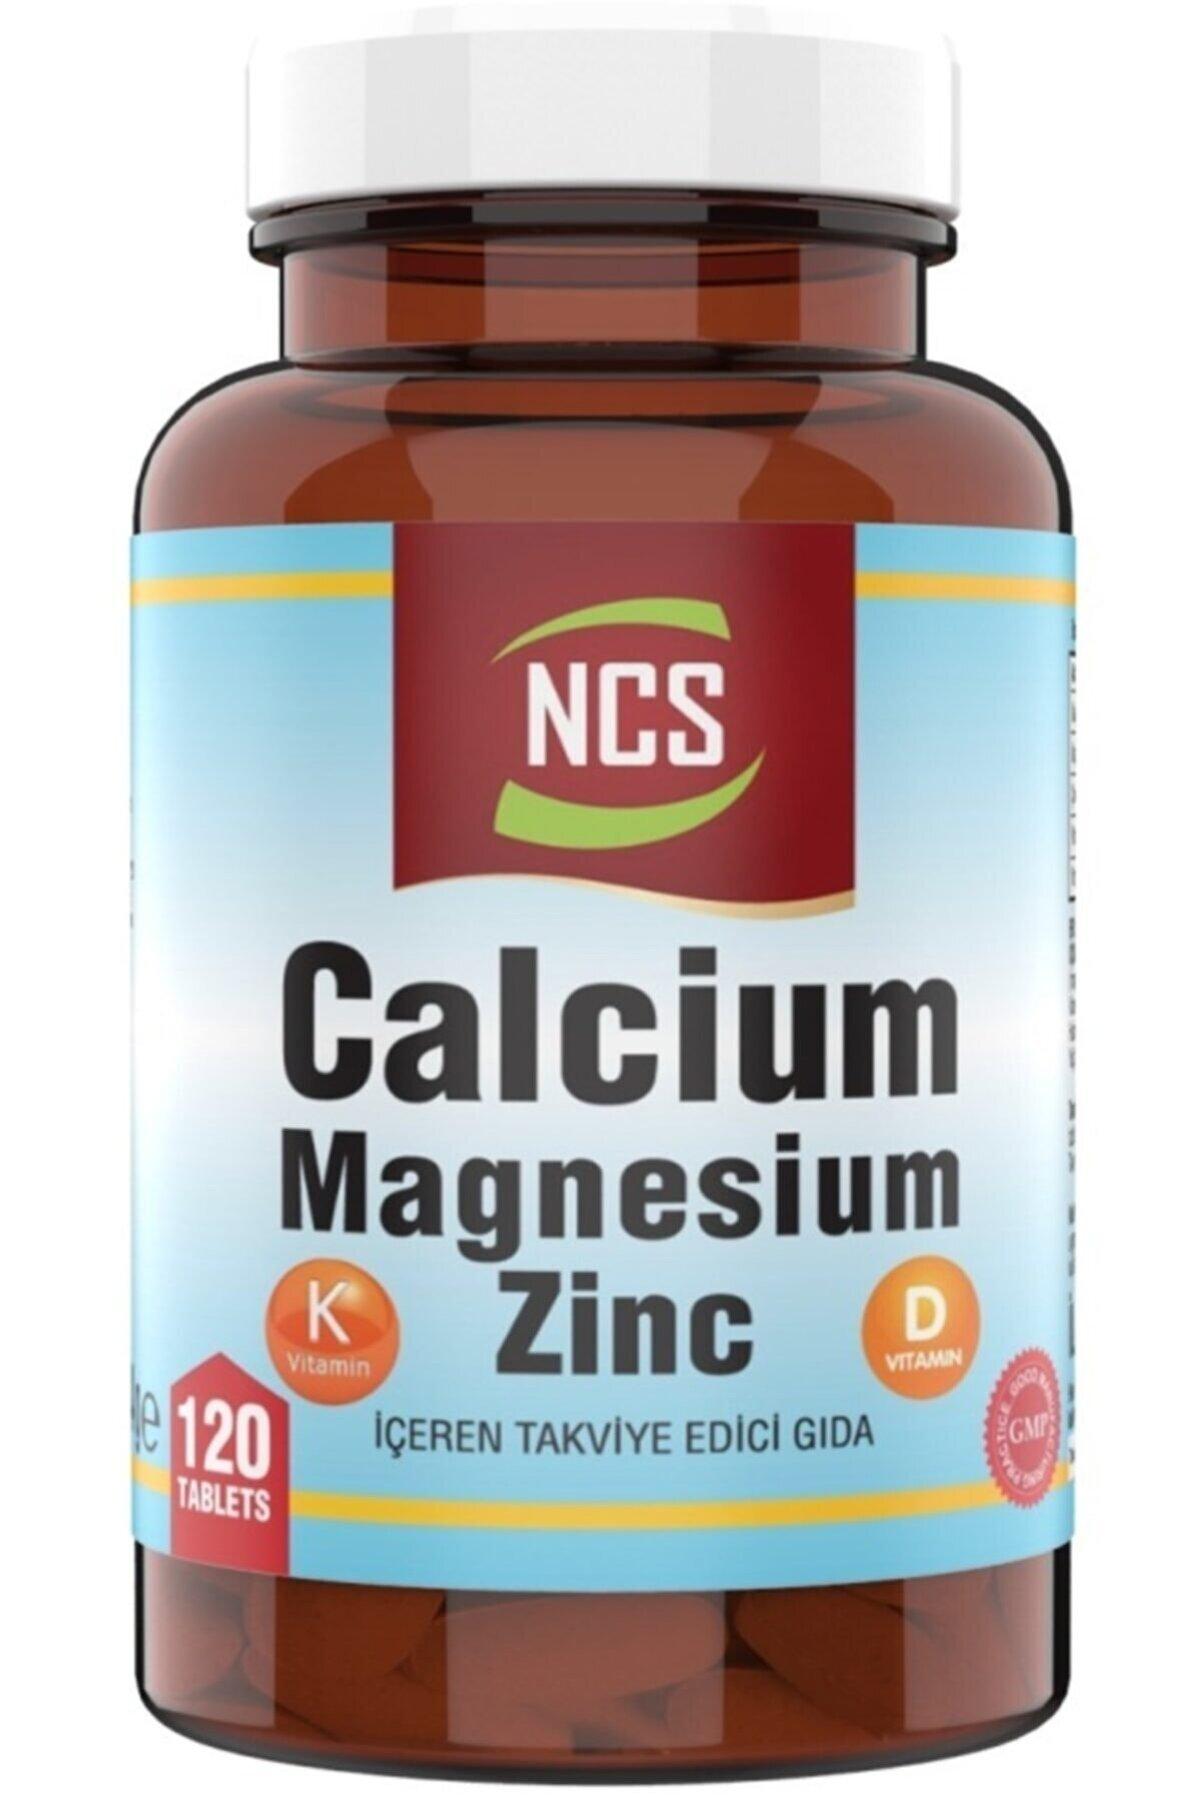 Ncs ® Calcium Magnesium Çinko D&k (kalsiyum Magnezyum Çinko) 120 Tablet